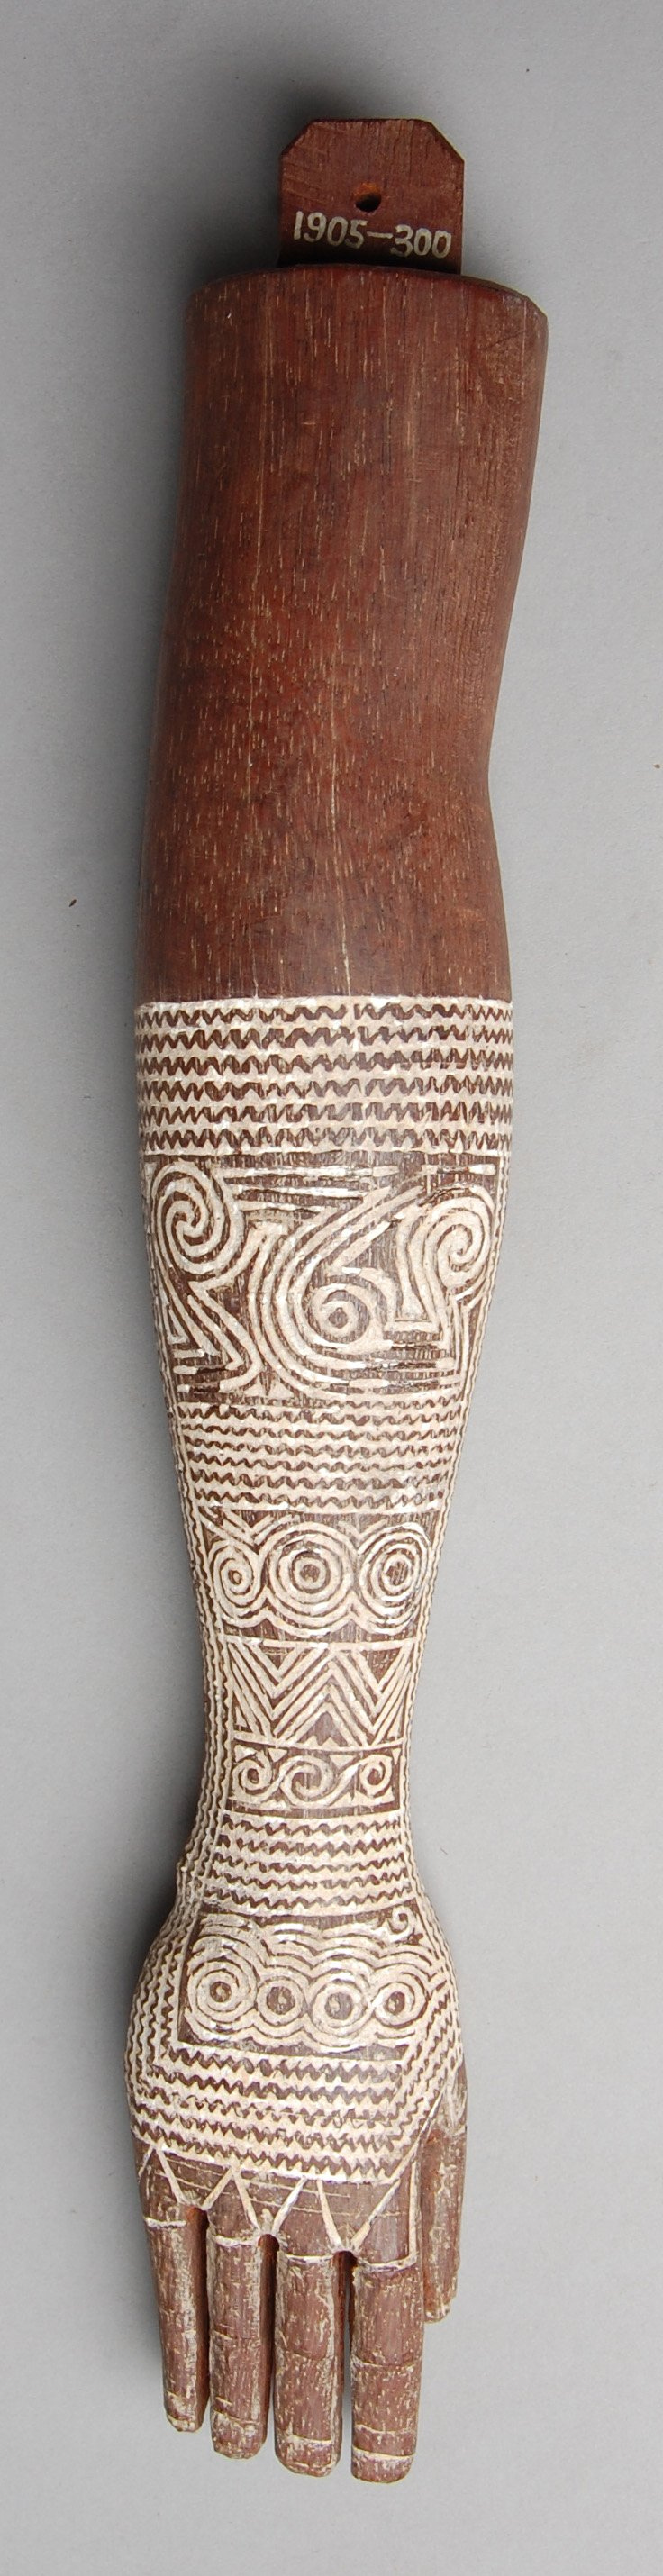 Kayan Tattoo Model © The British Museum | United Kingdom